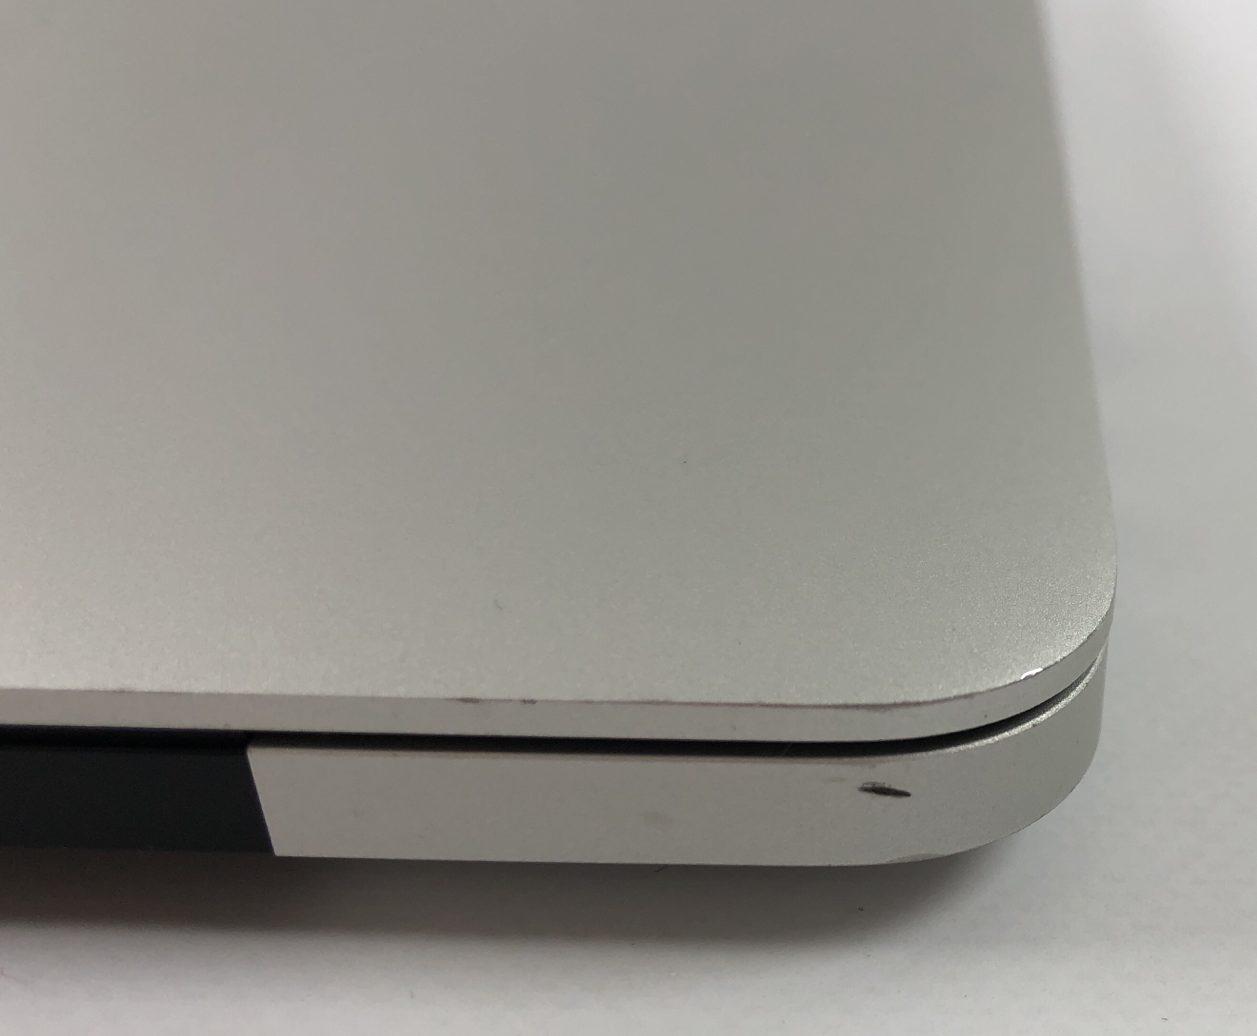 "MacBook Pro Retina 13"" Early 2015 (Intel Core i5 2.7 GHz 16 GB RAM 256 GB SSD), Intel Core i5 2.7 GHz, 16 GB RAM, 256 GB SSD, Afbeelding 4"